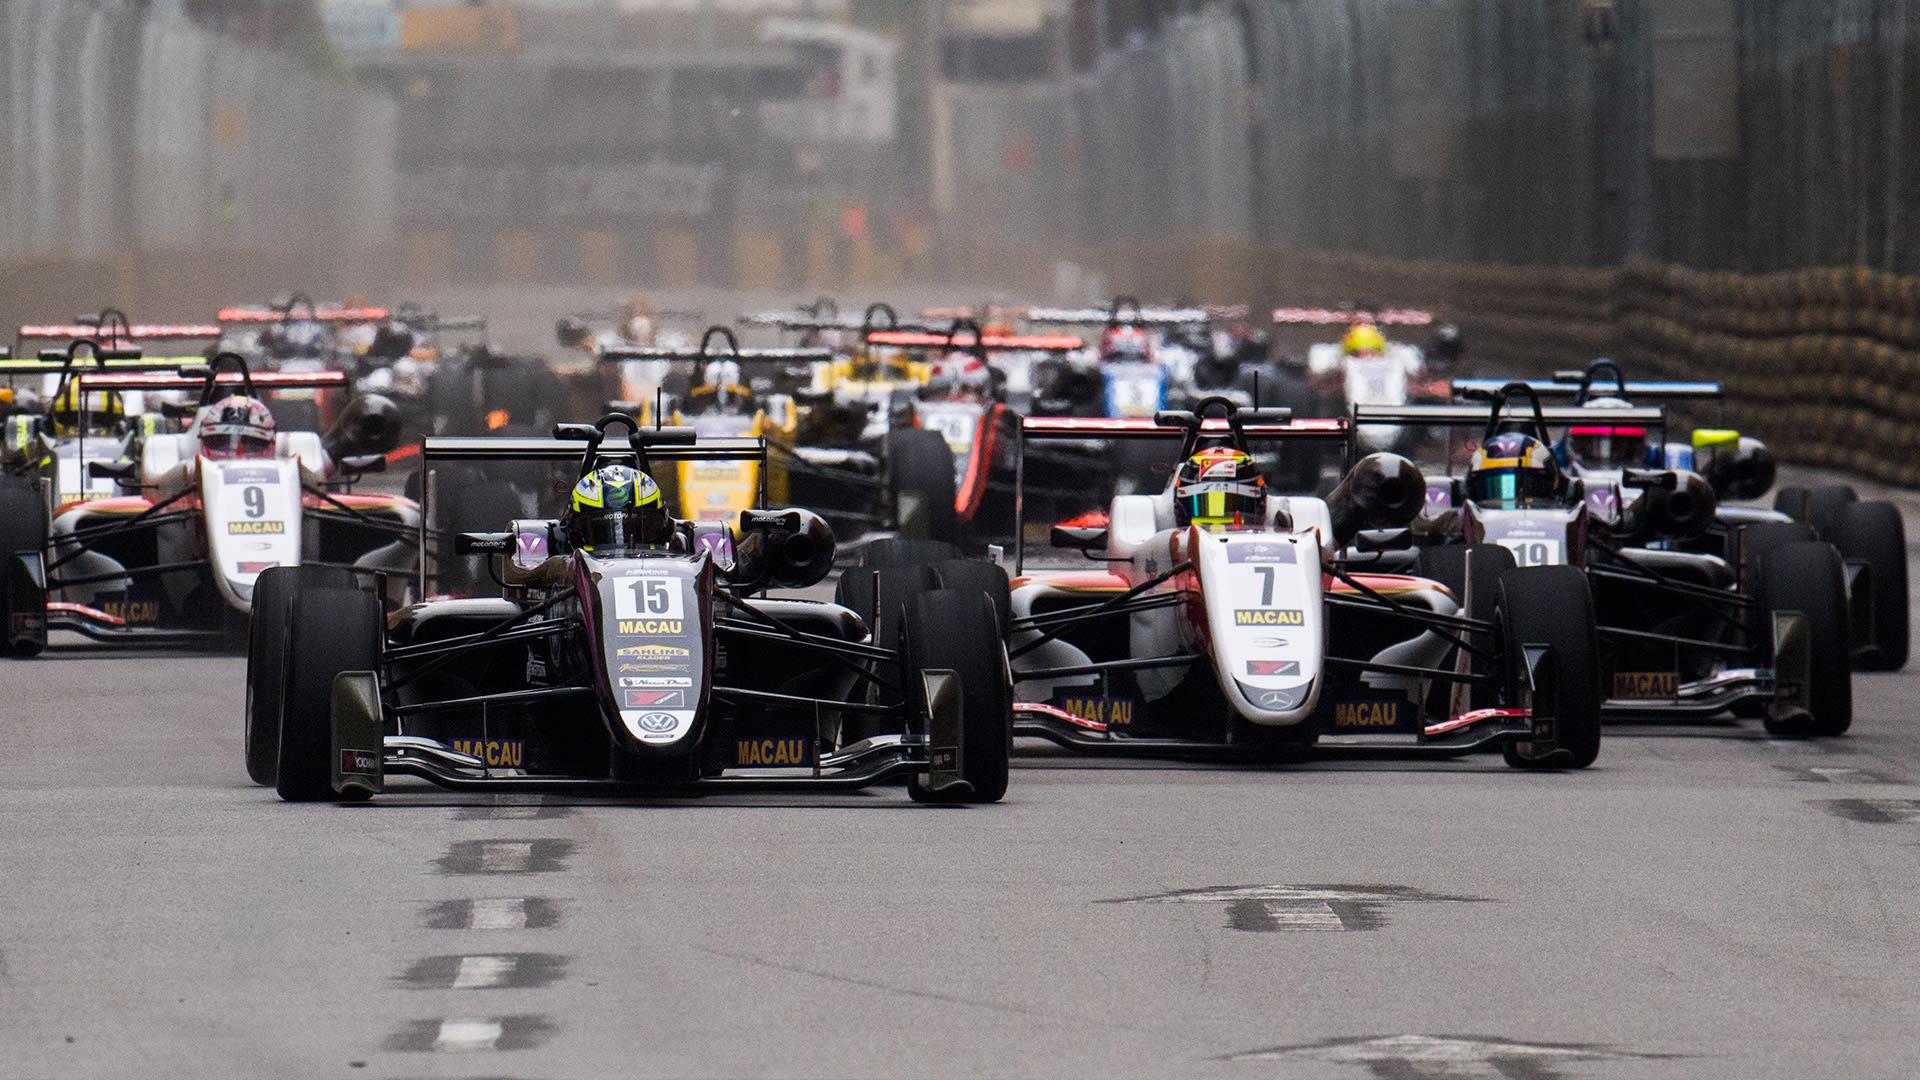 Macau Grand Prix 2017 >> Road To F1 5 Reasons To Watch The Macau Grand Prix